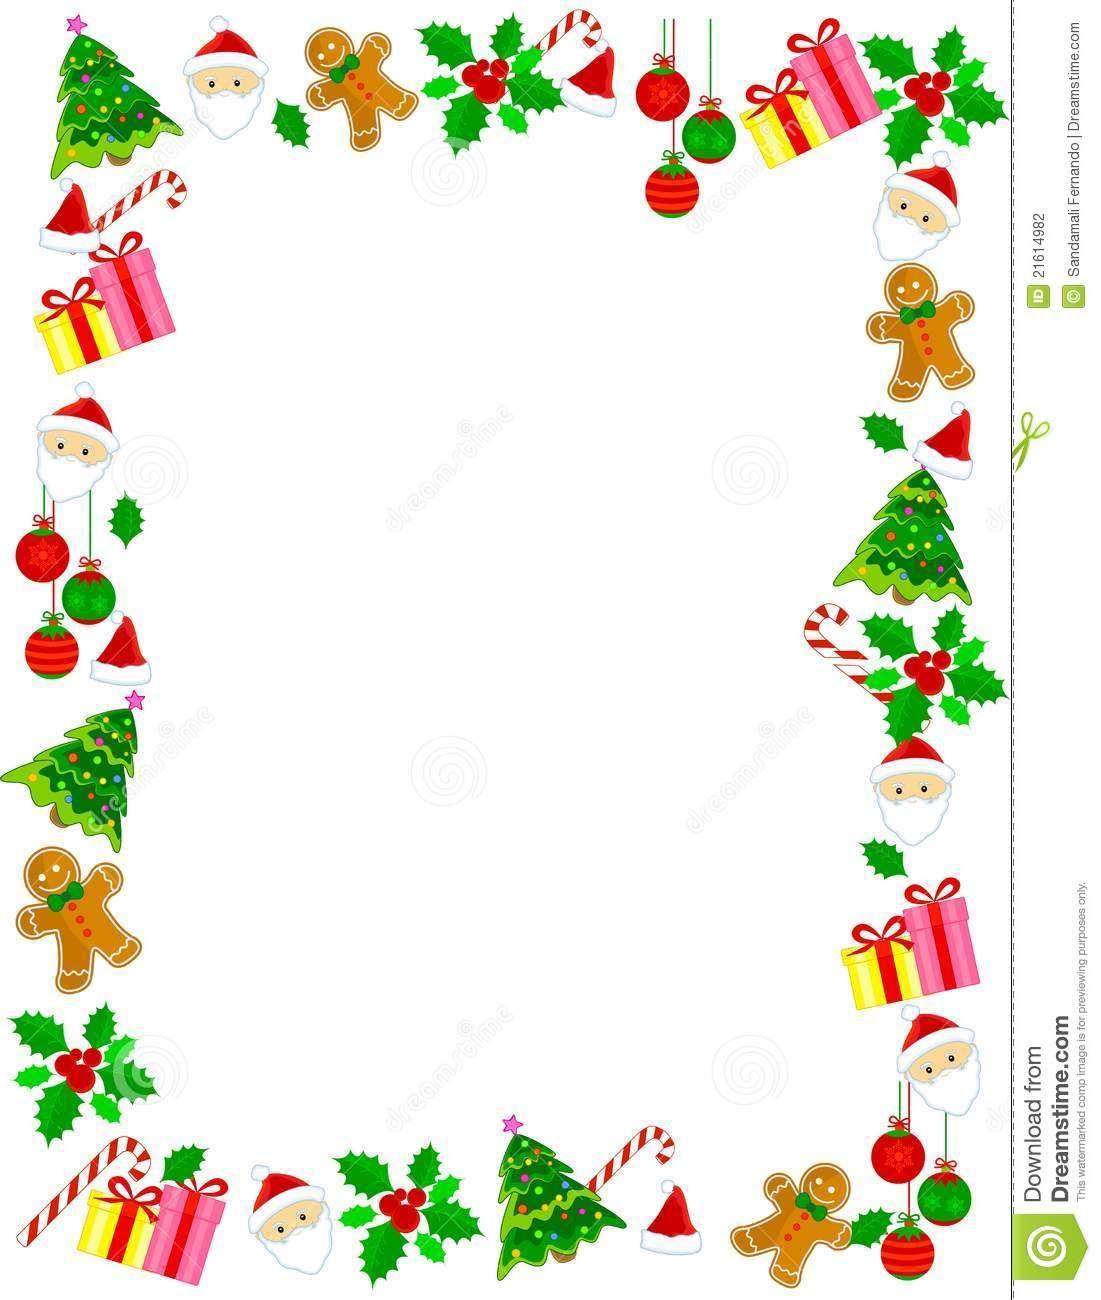 Christmas Border / Frame Download From Over 50 Million